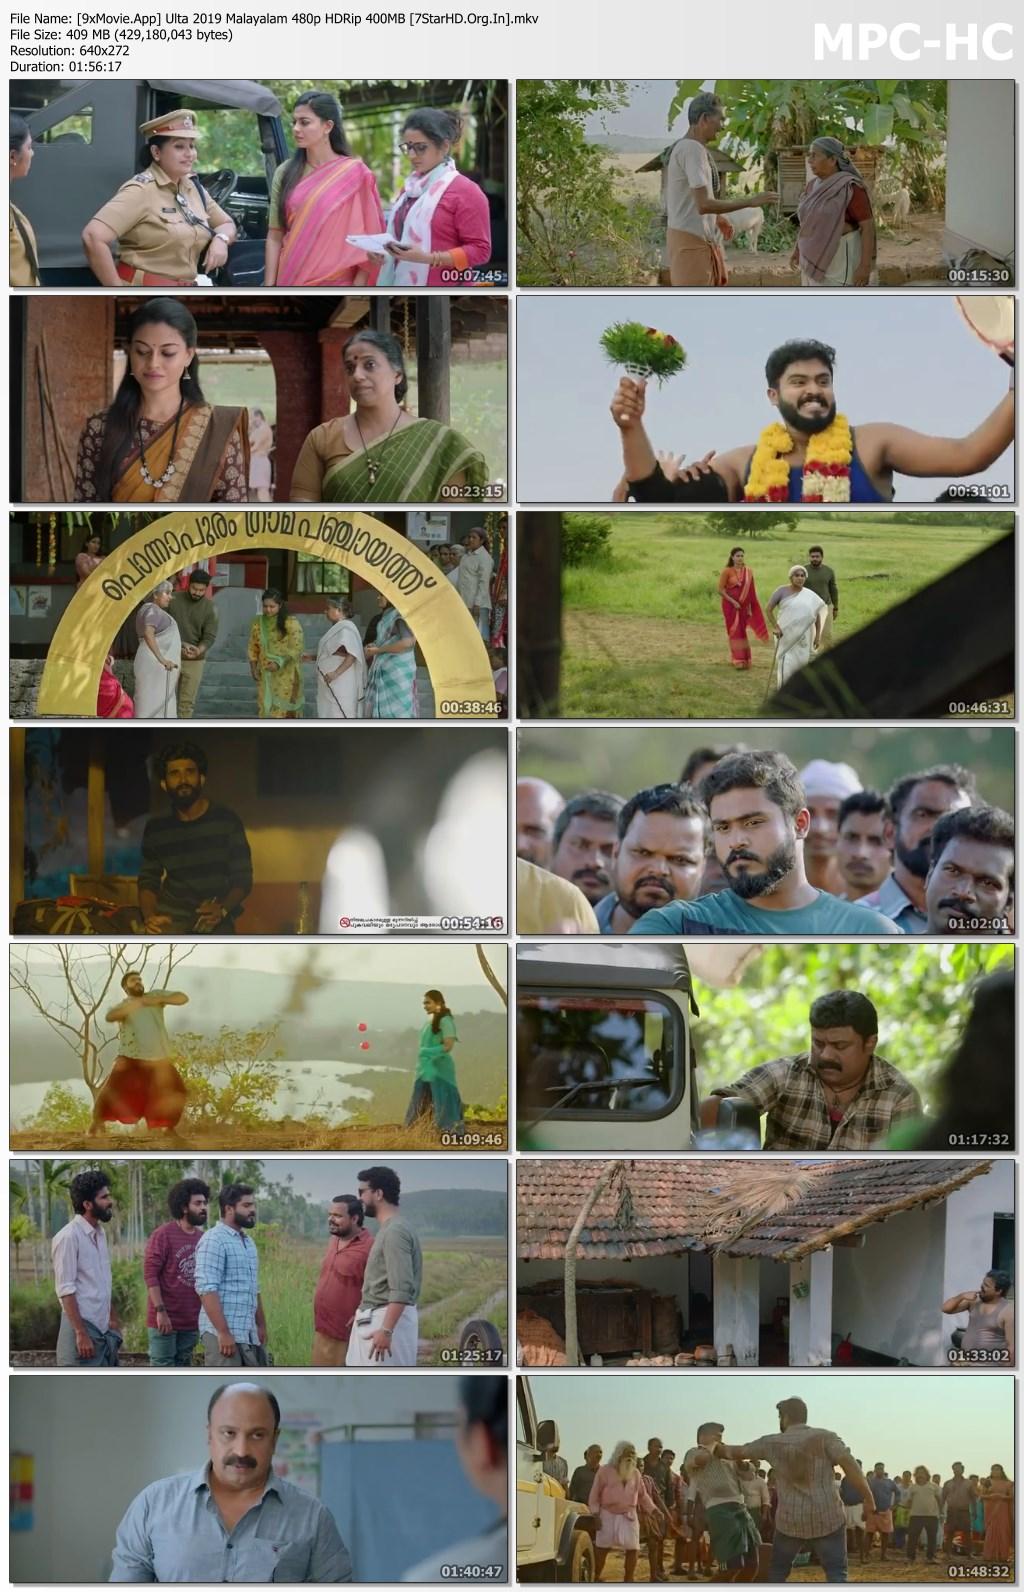 Ulta 2019 Malayalam 480p HDRip x264 400MB